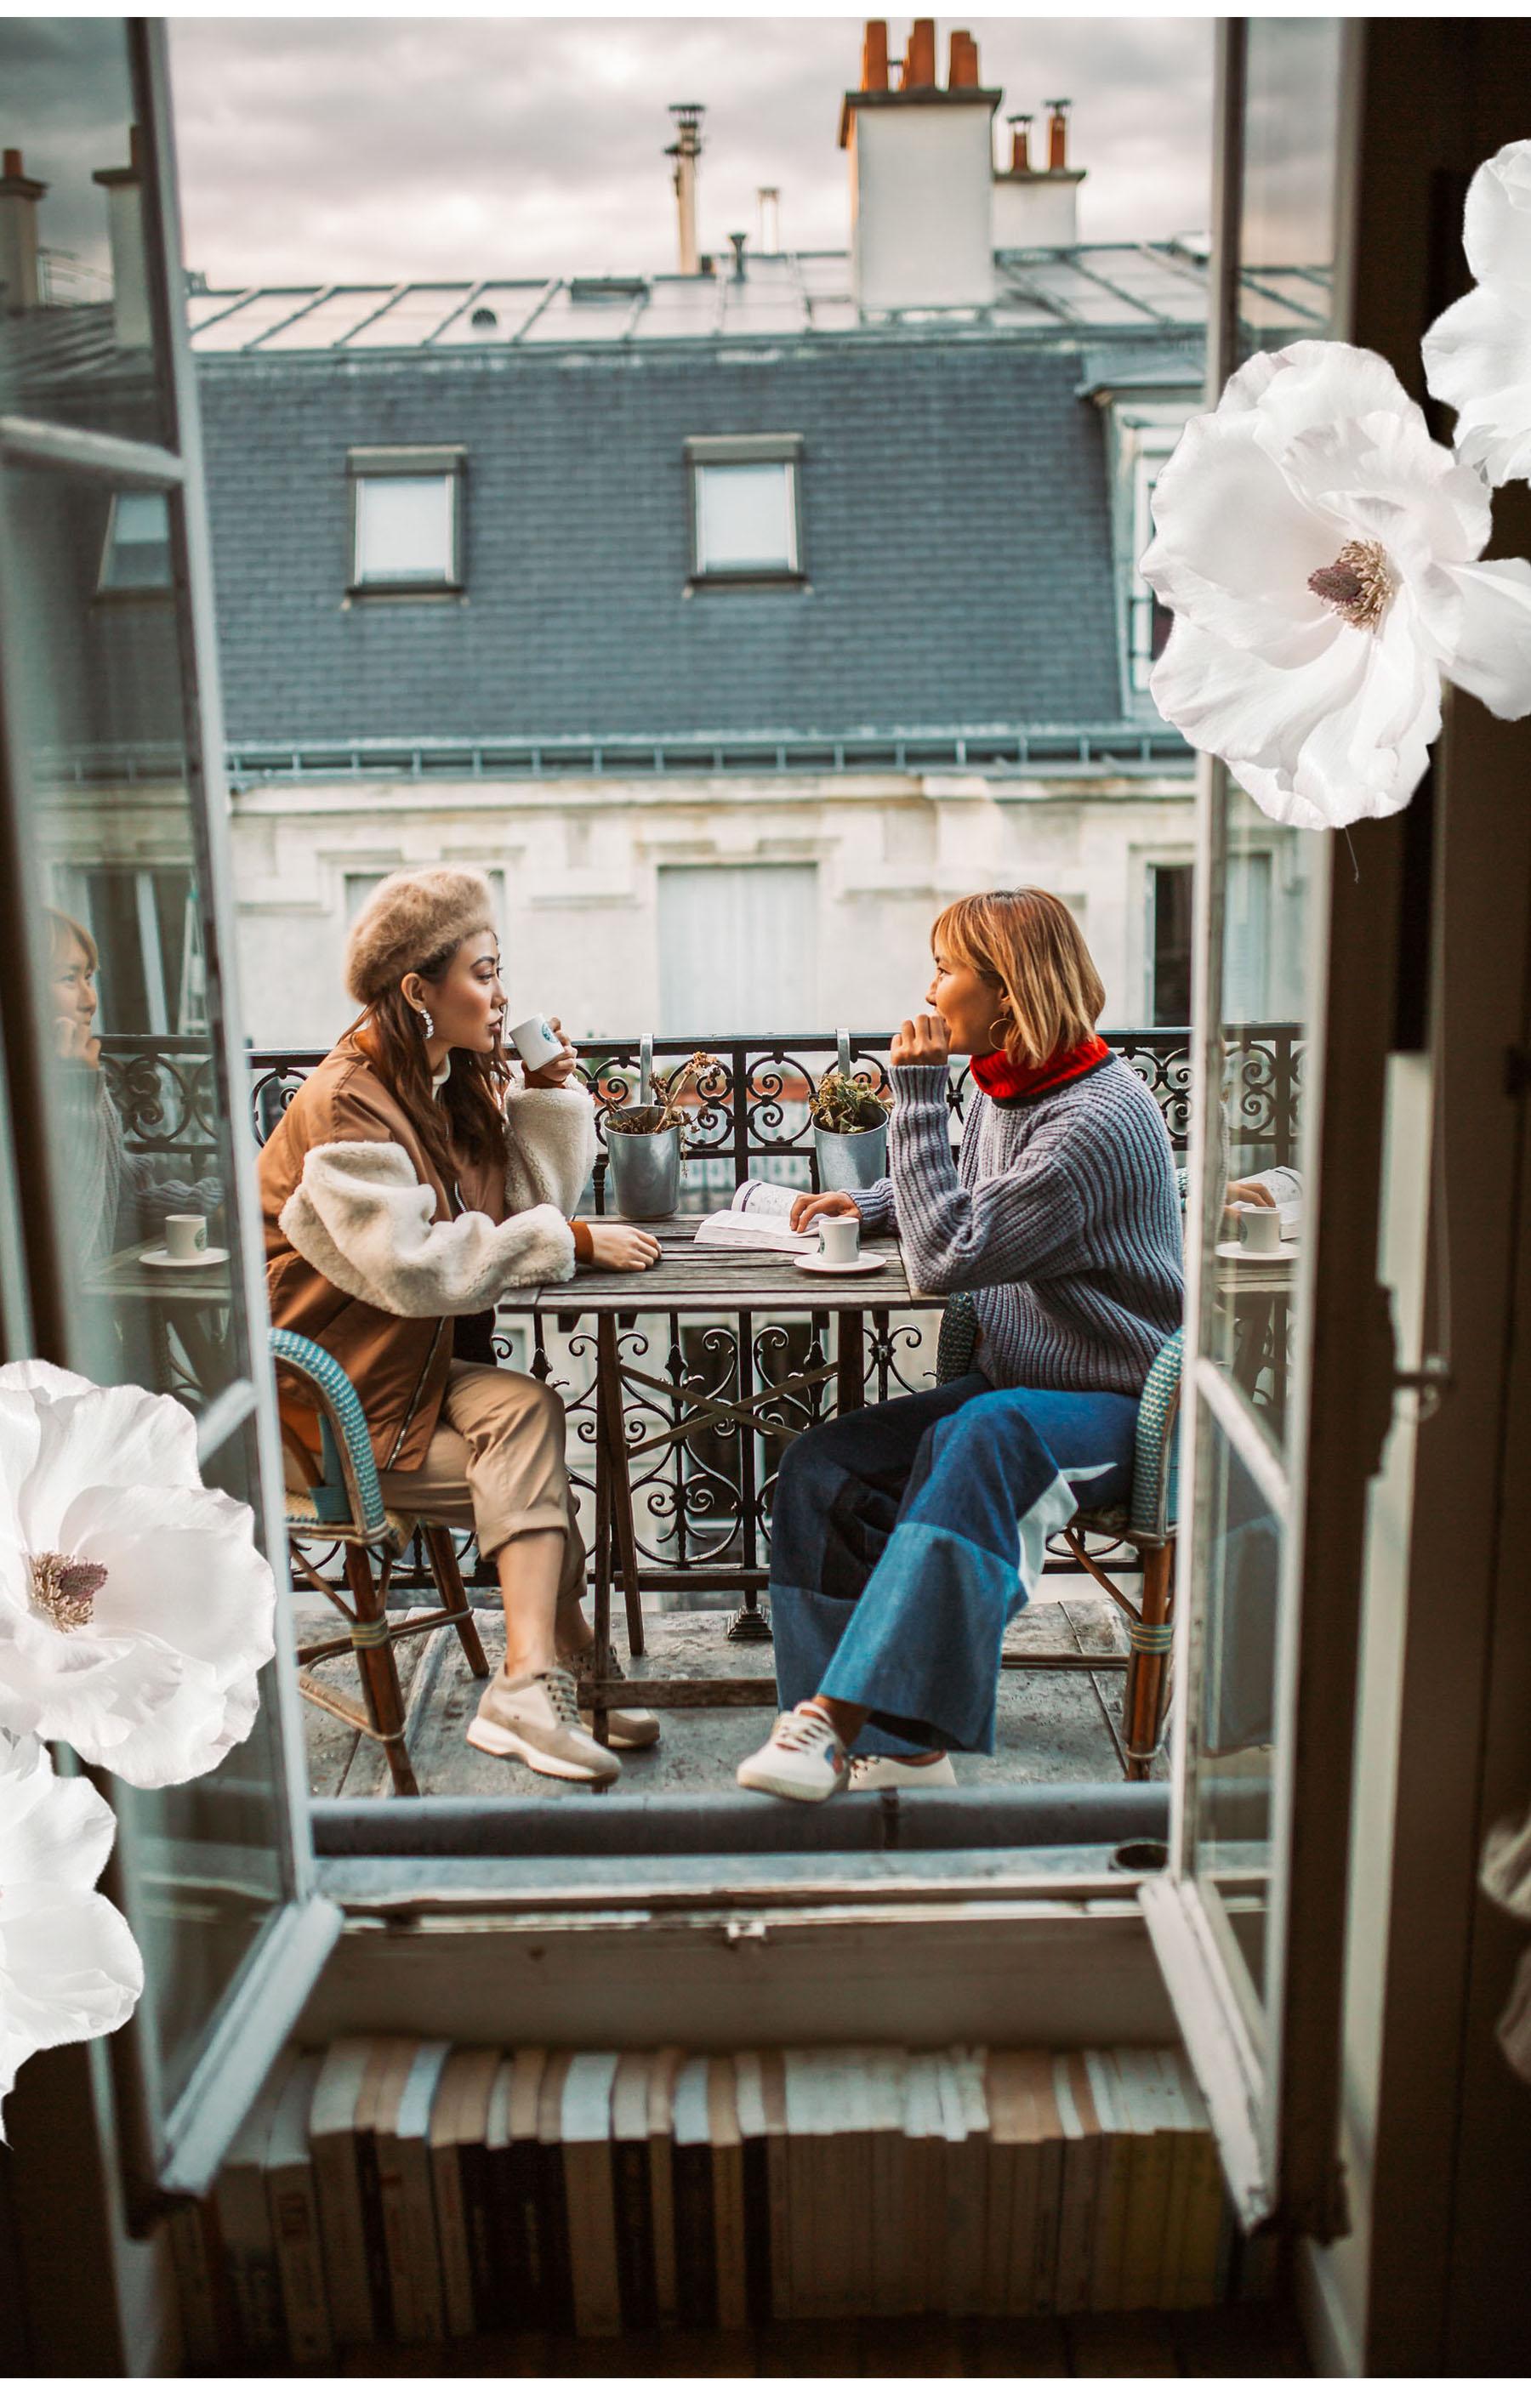 How to Experience Paris like a Local - Balconies in Paris, Paris cafes // Notjessfashion.com